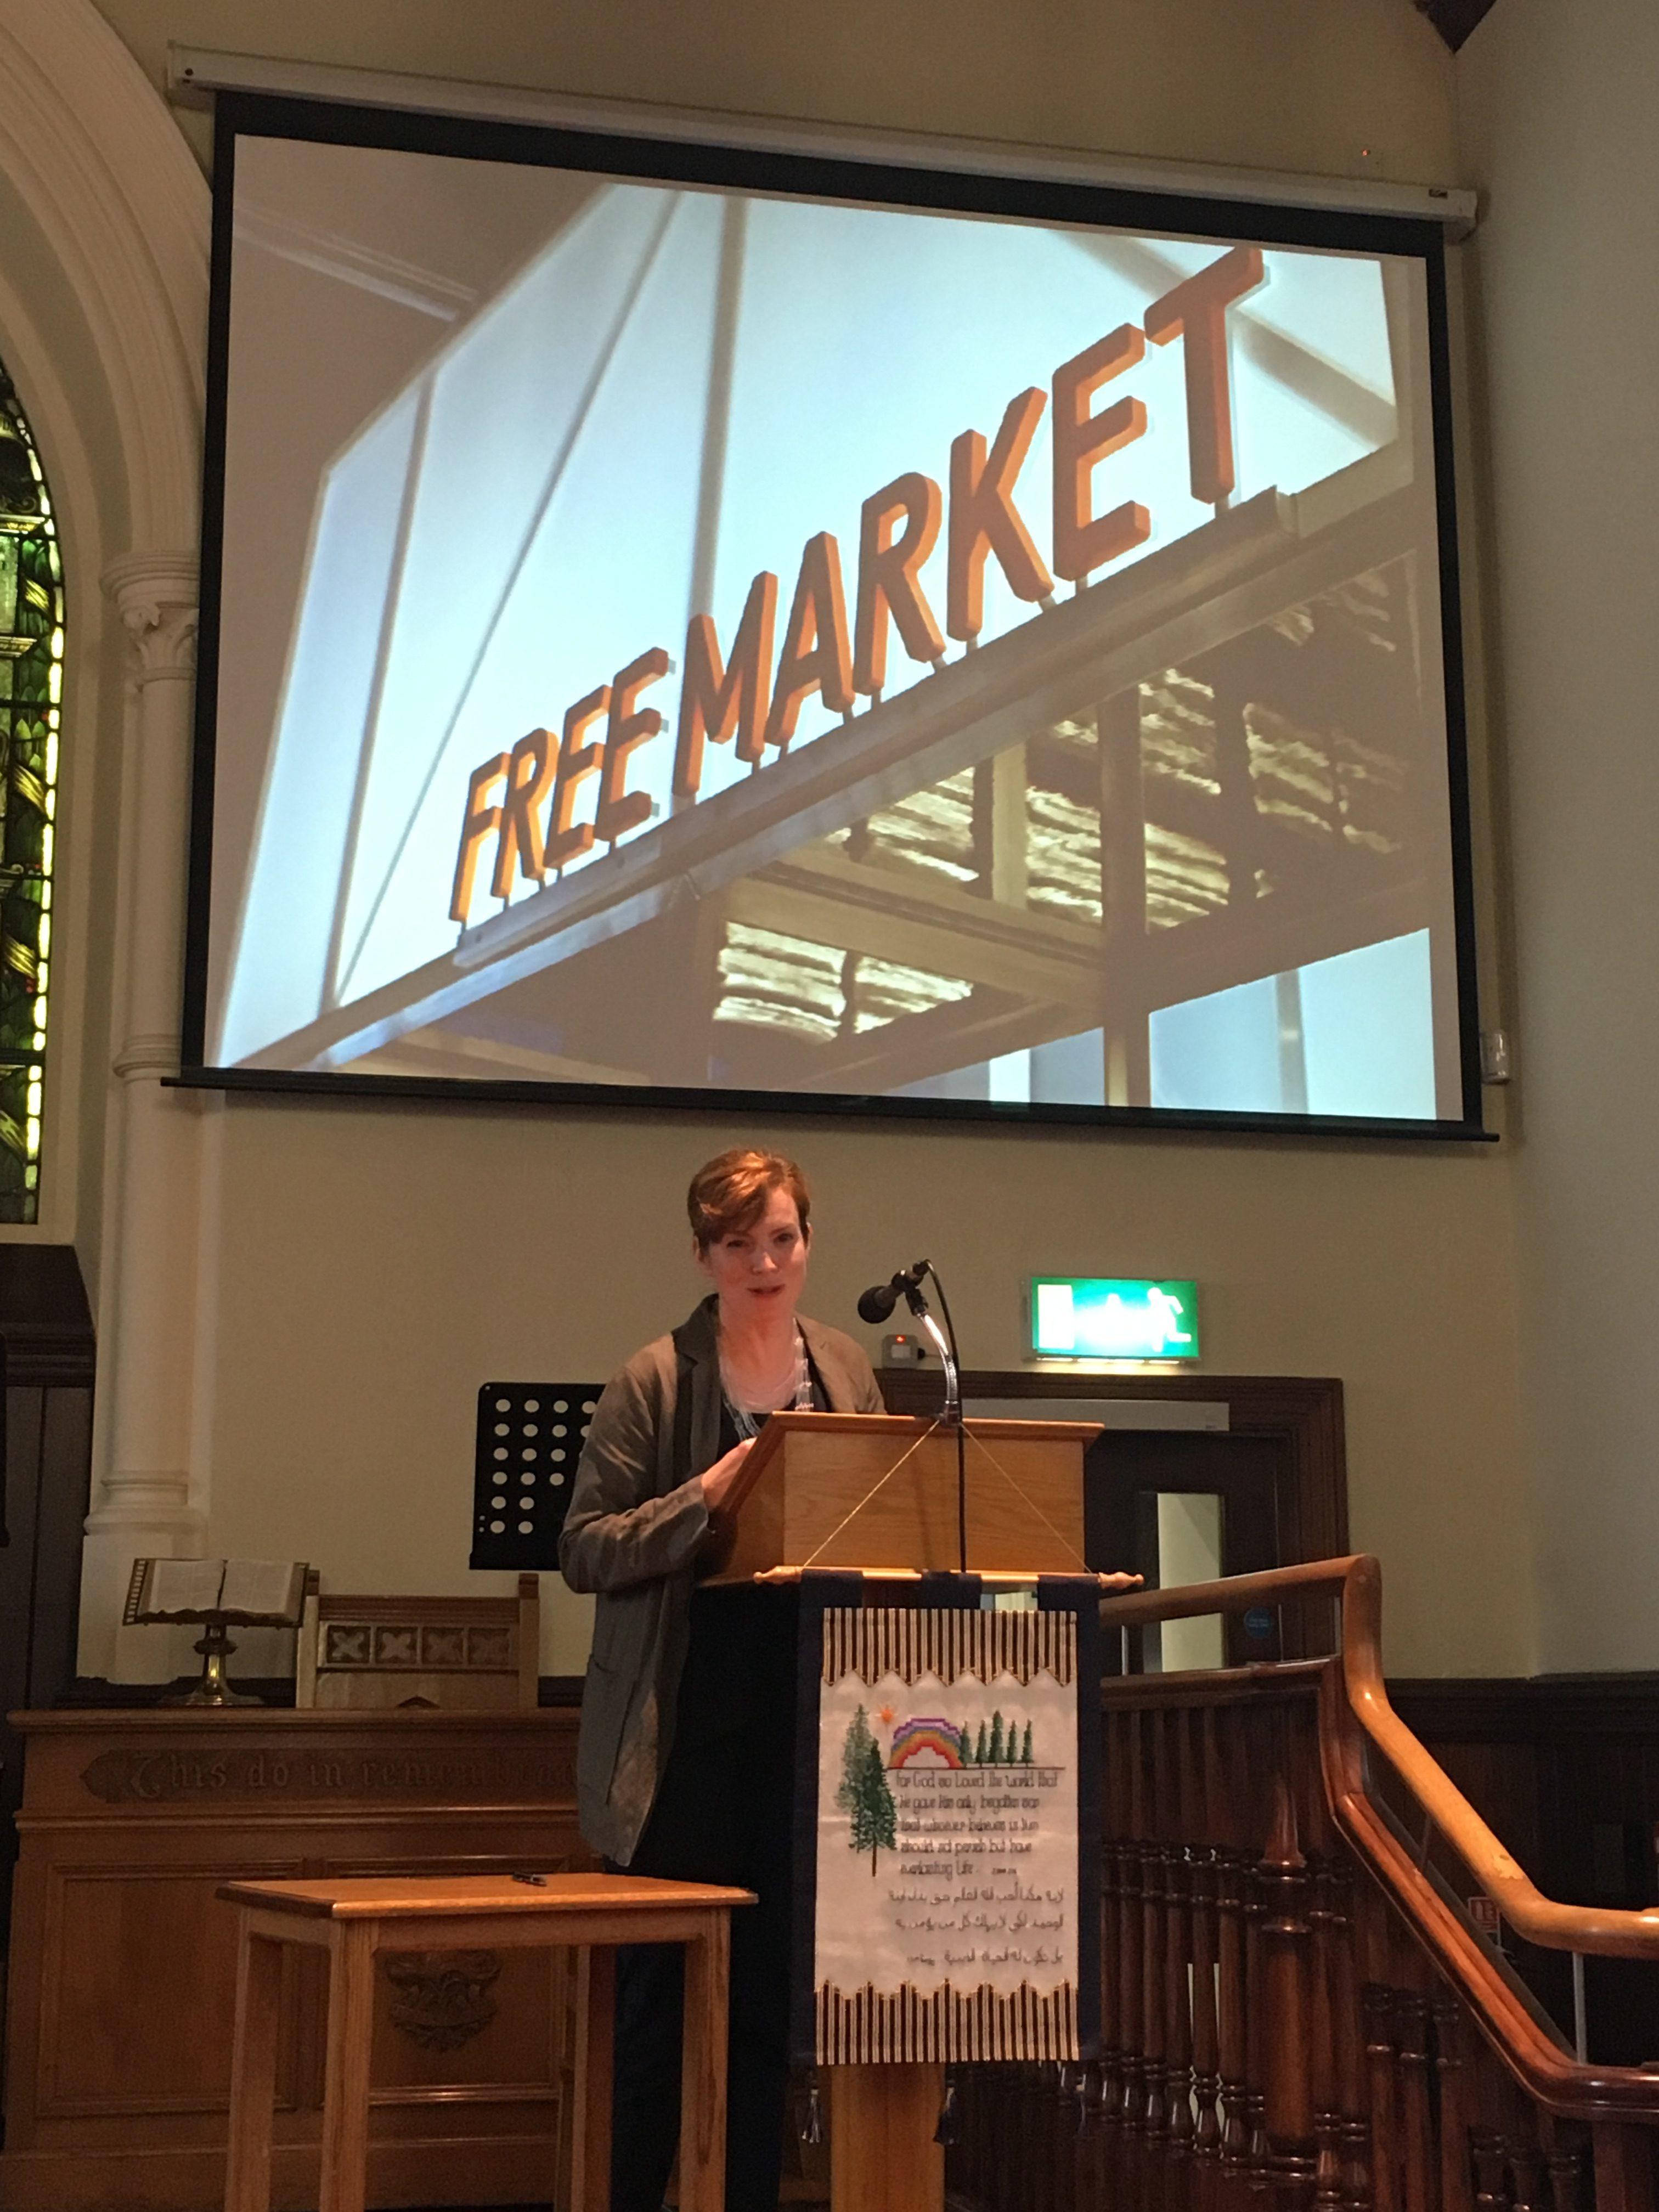 Miriam-Delany-Free-Market-presentation-CWF-summer-school-2019-Ian-Lennon-image.JPG#asset:12366